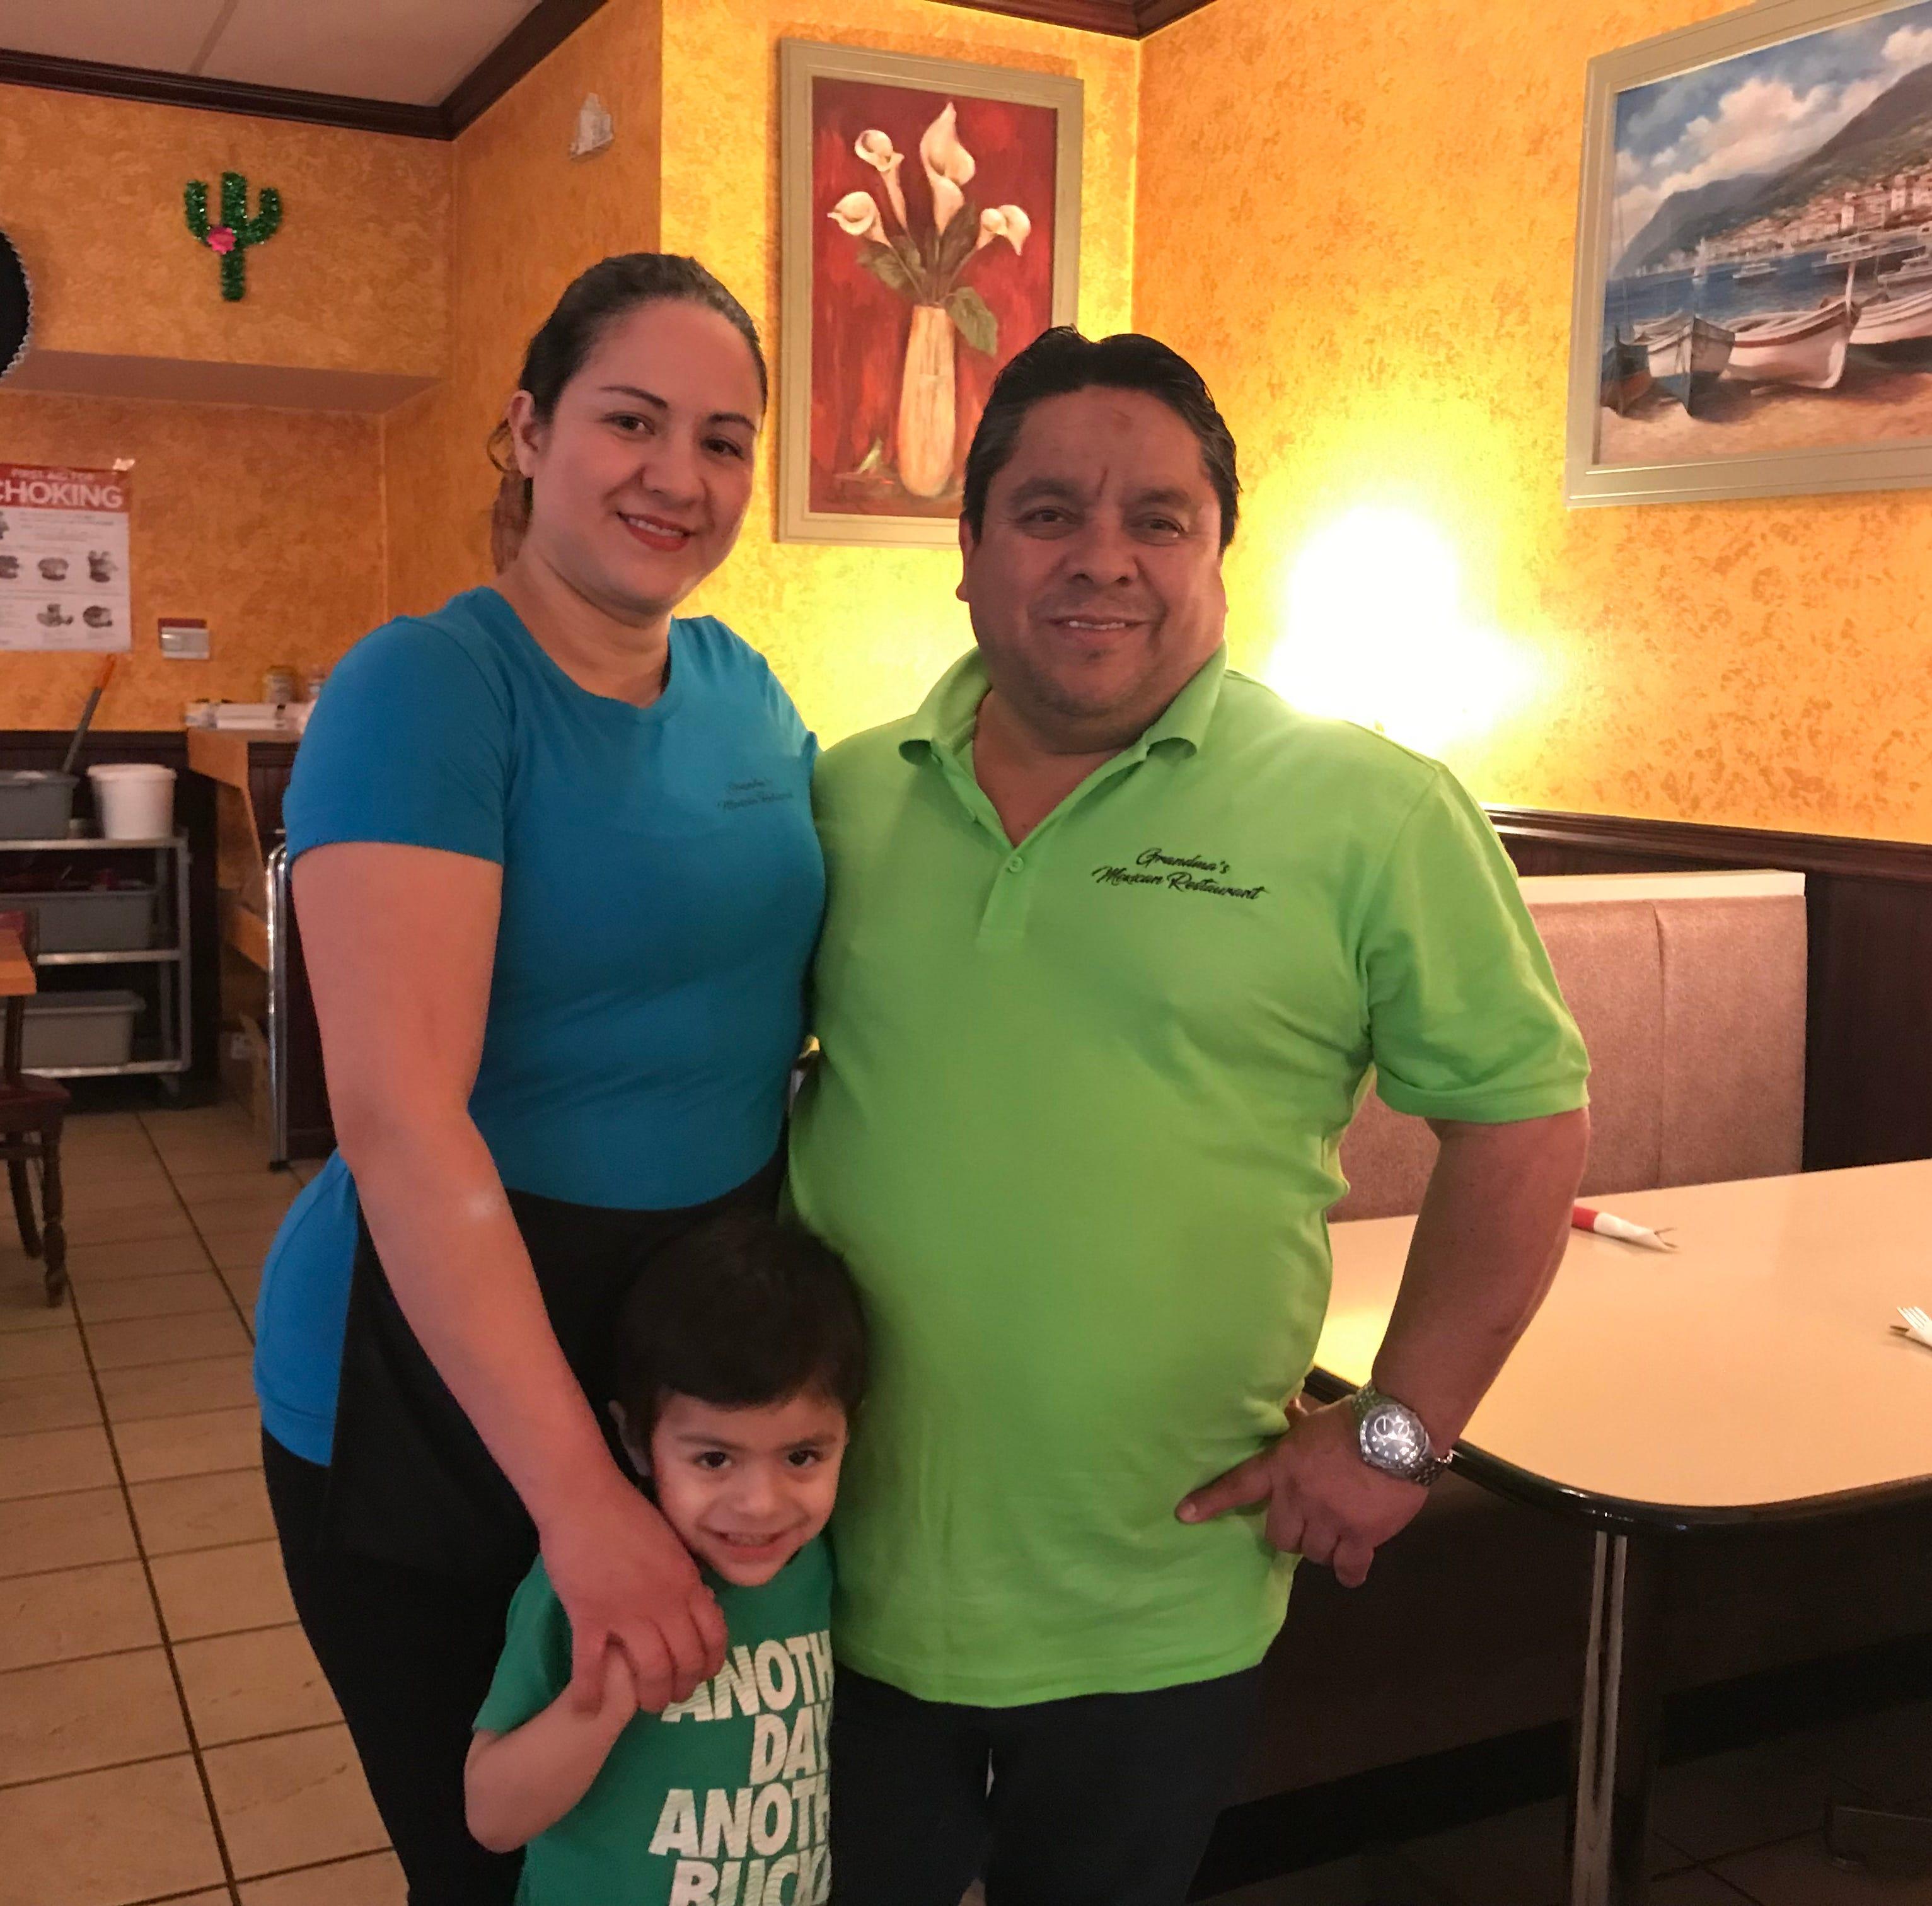 New Endicott Mexican restaurant uses Grandma's recipes